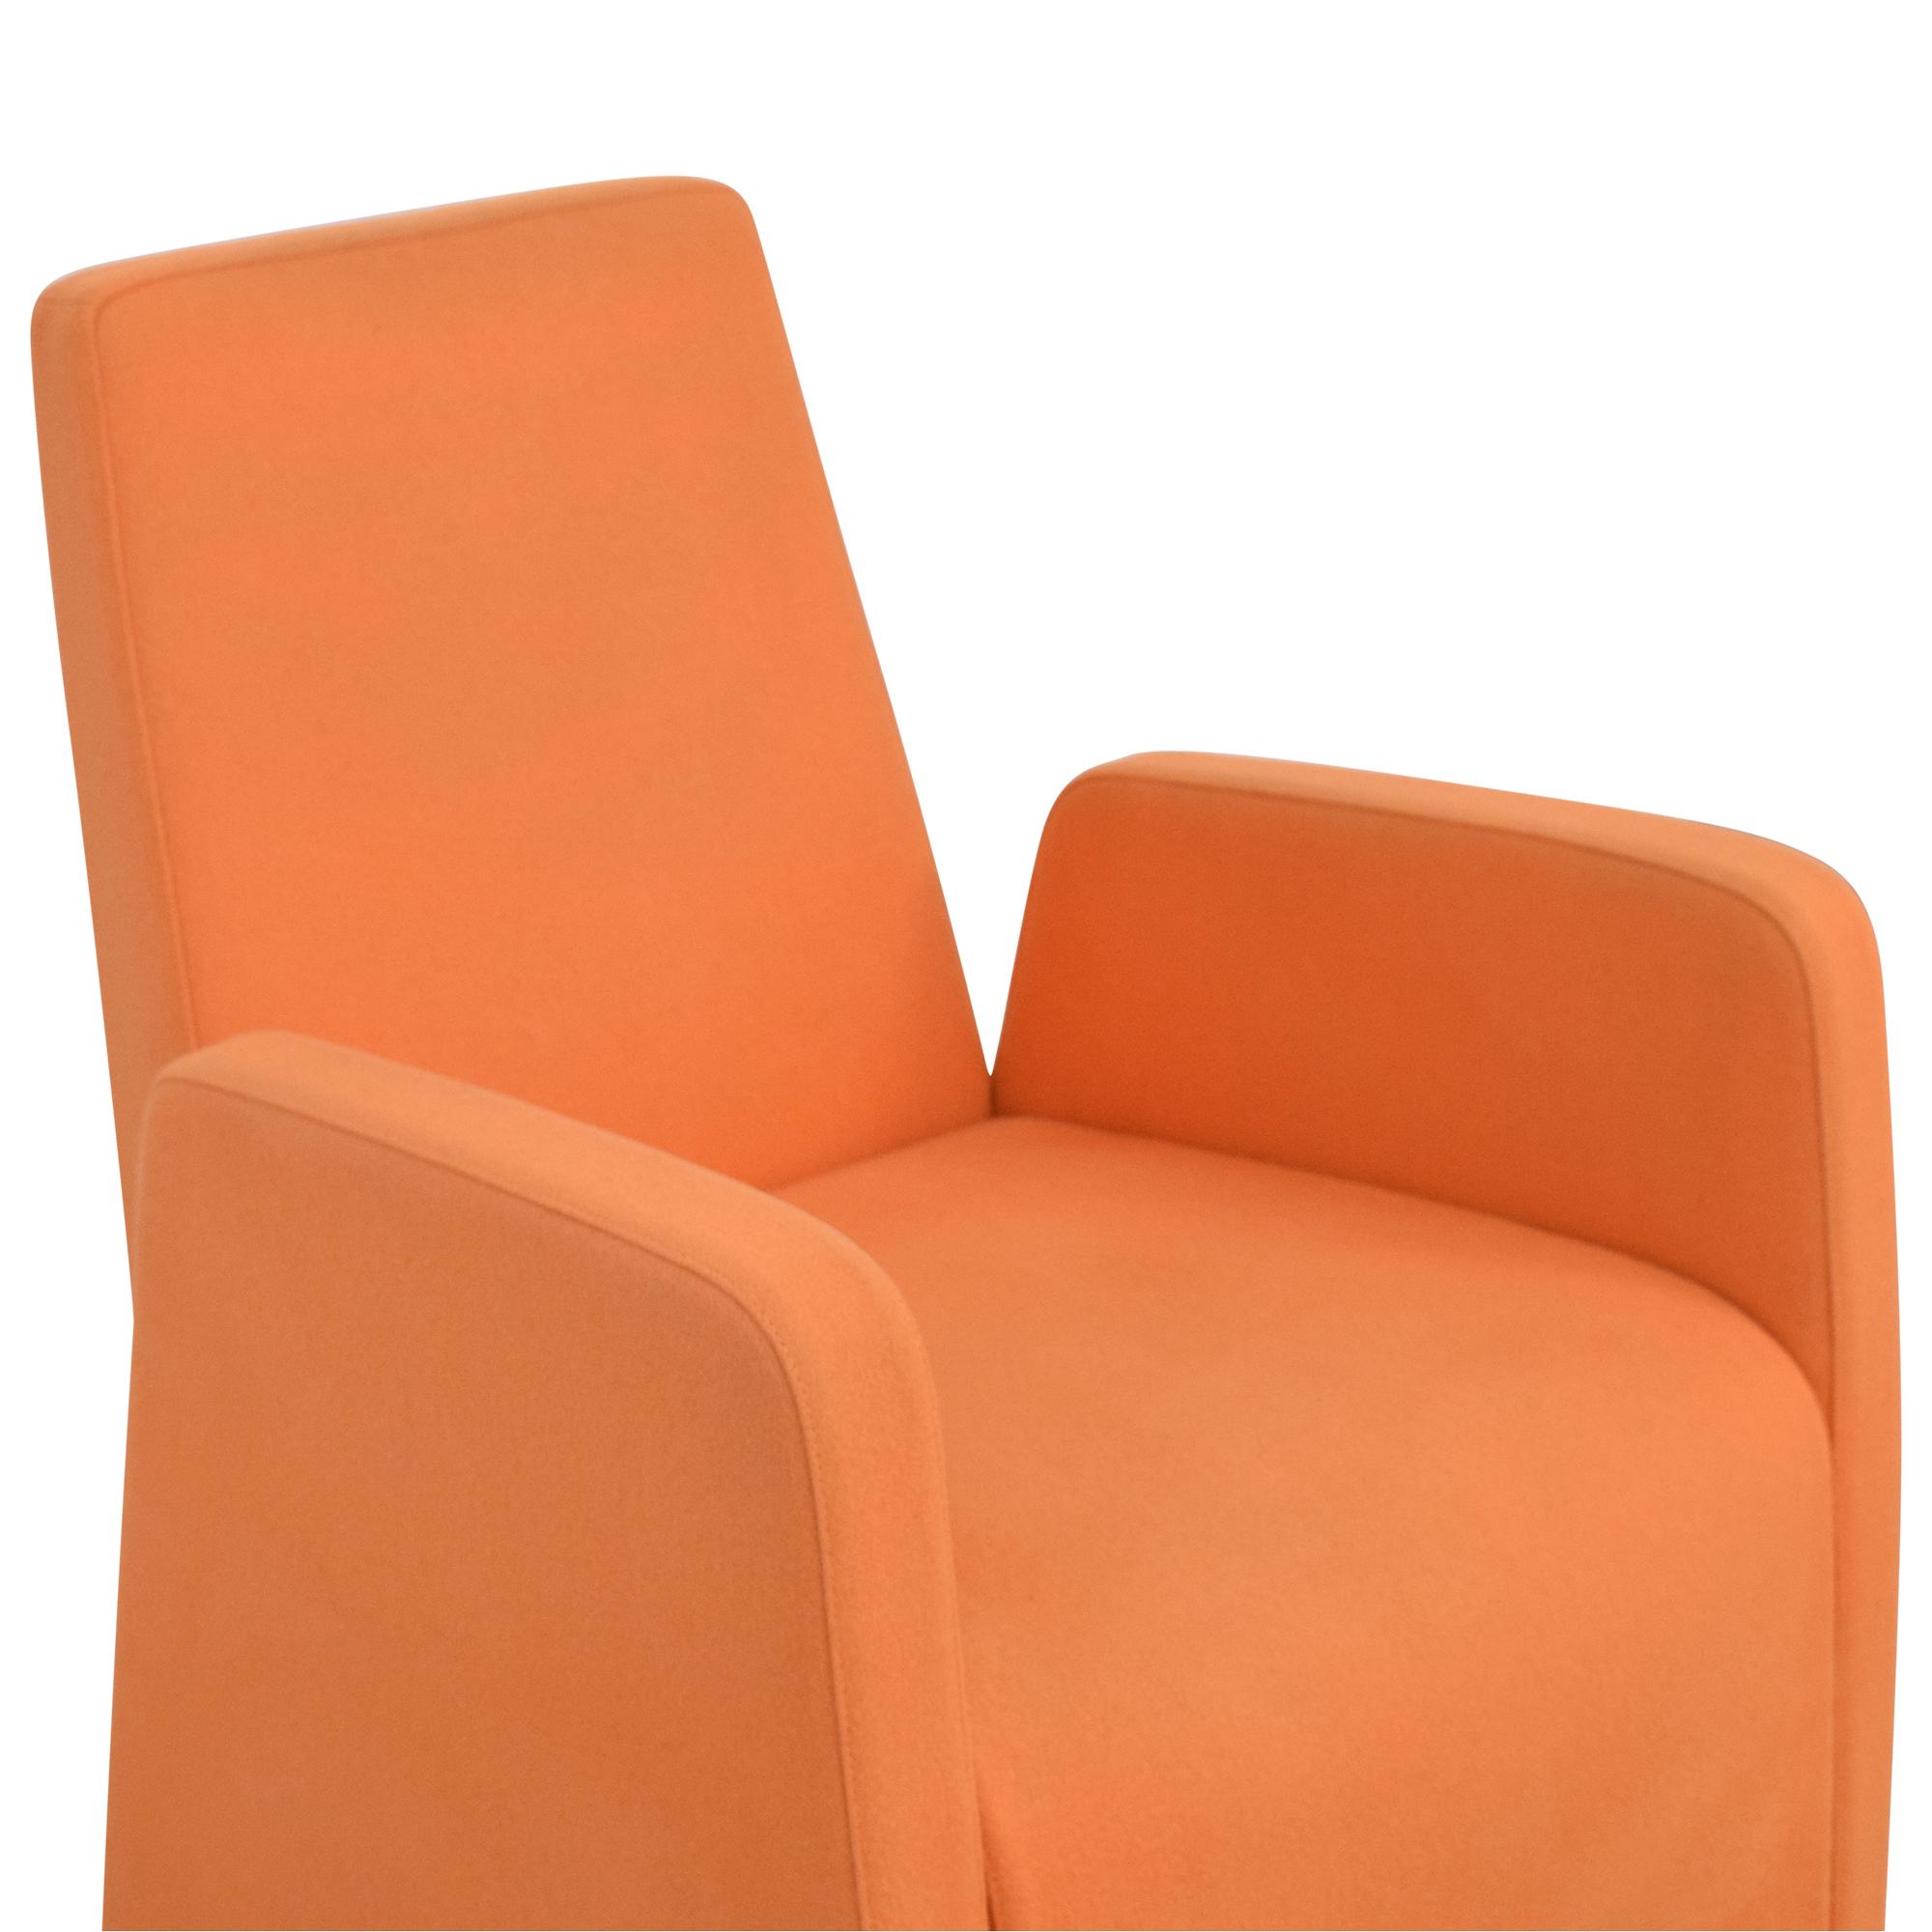 Baleri Italia Tato Orange Chair / Accent Chairs